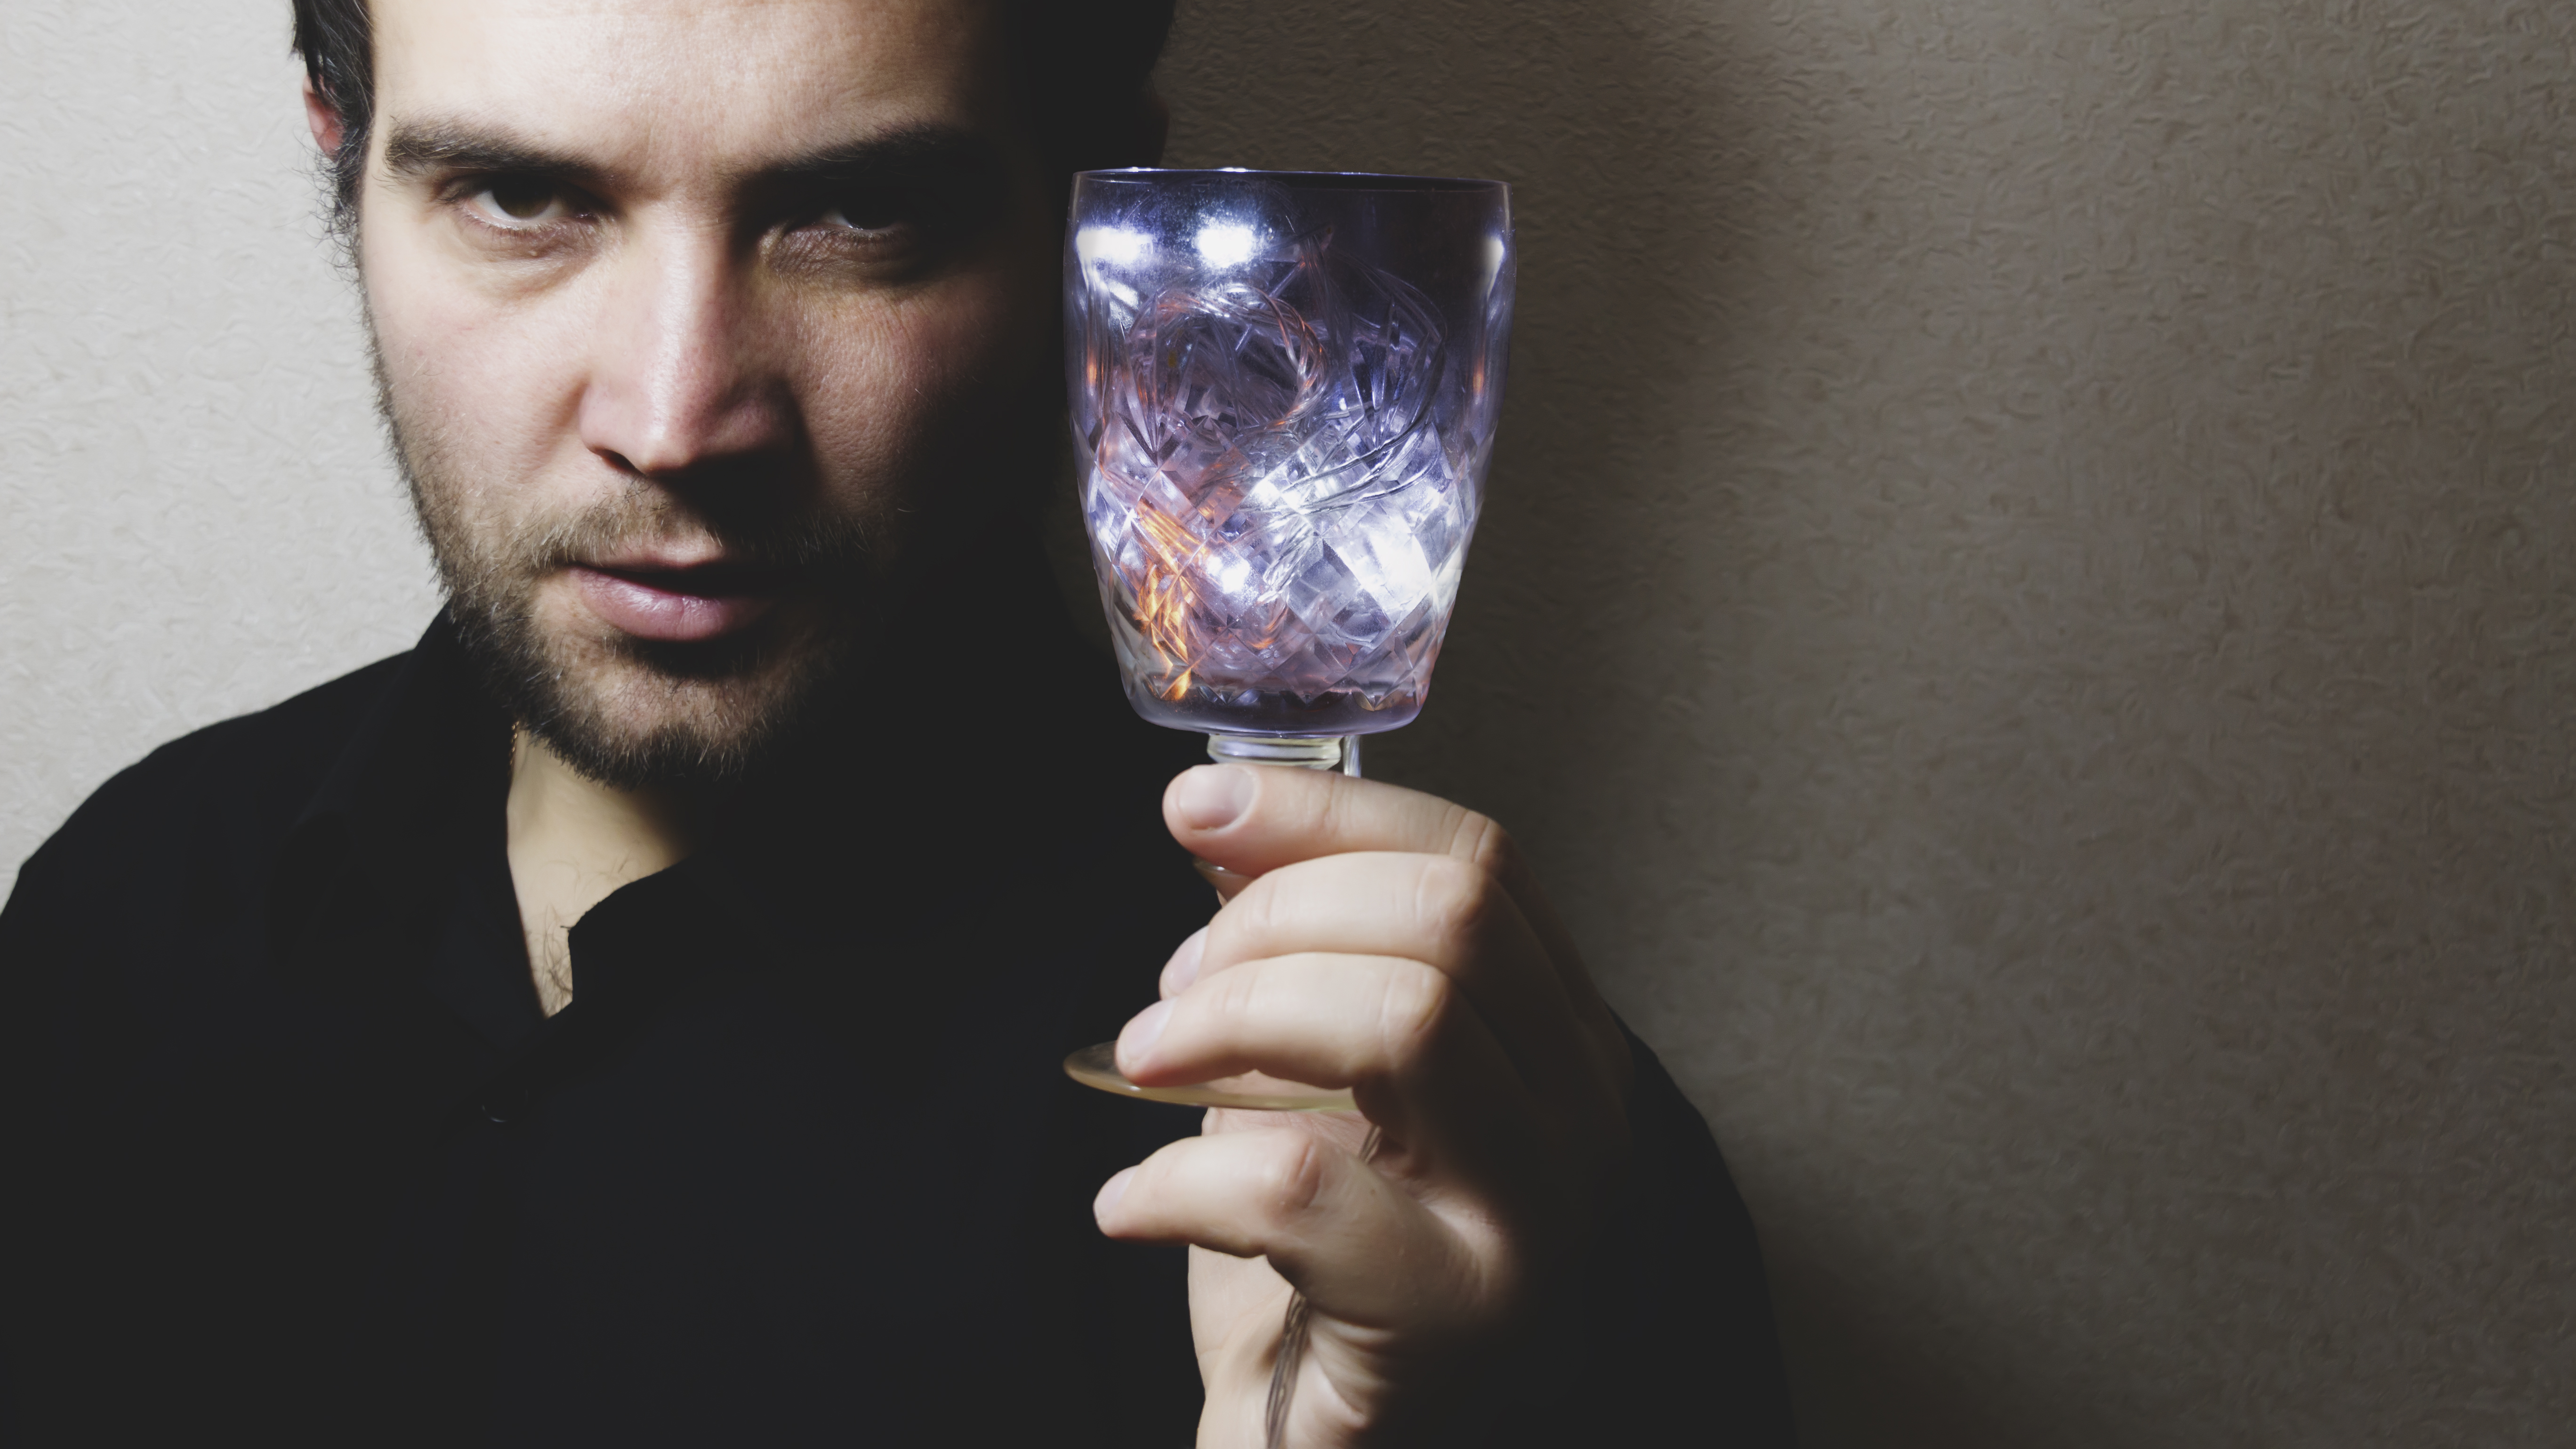 Man holding wine glass photo